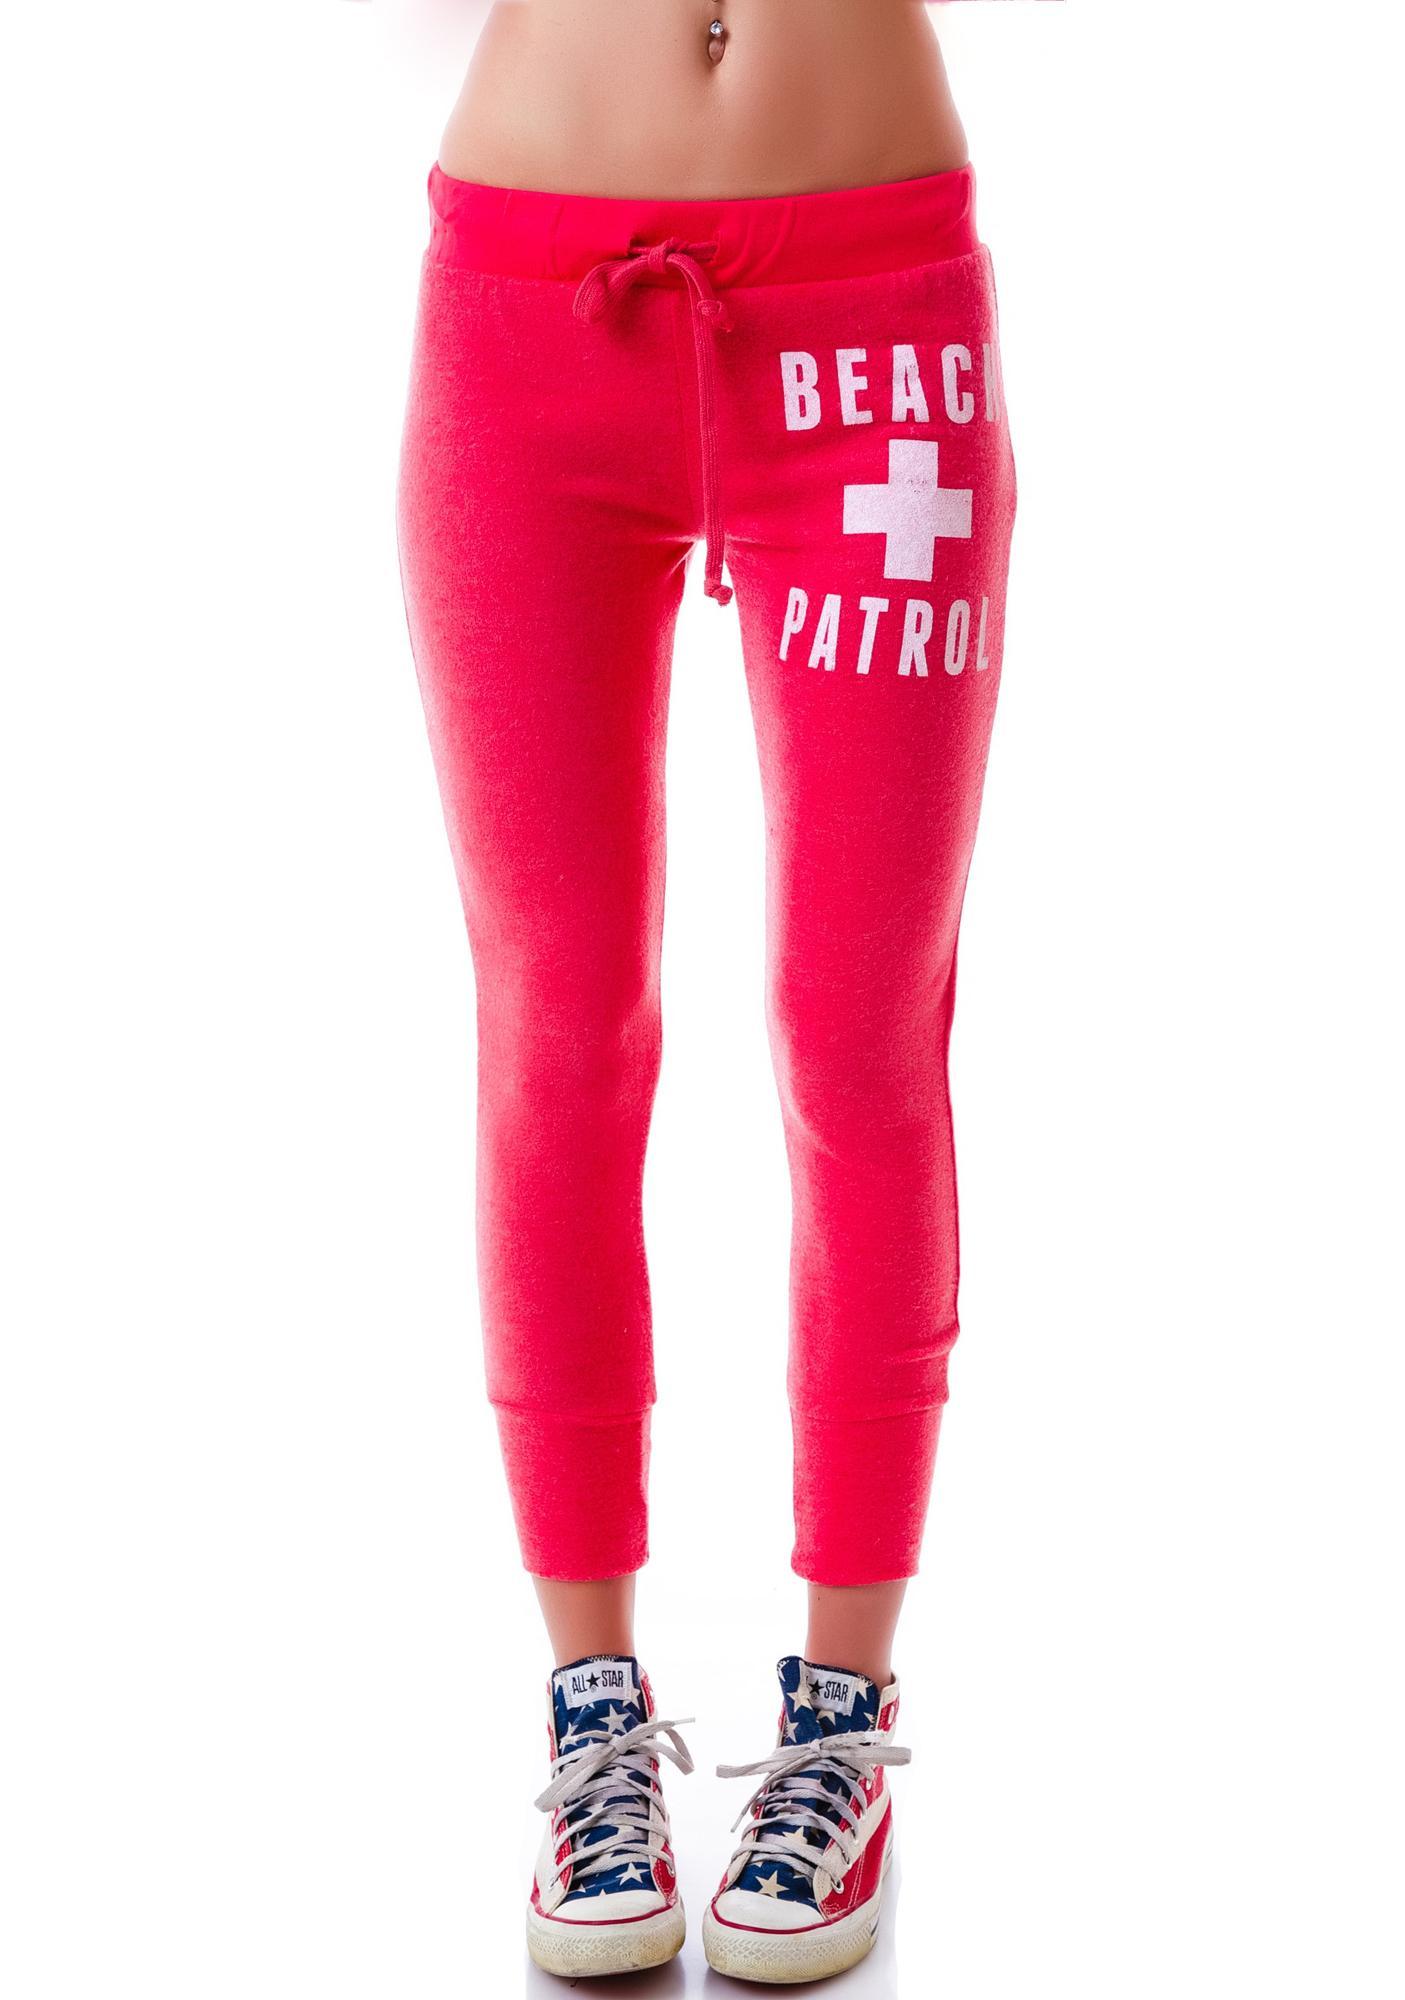 Beach Patrol Drawstring Sweatpants